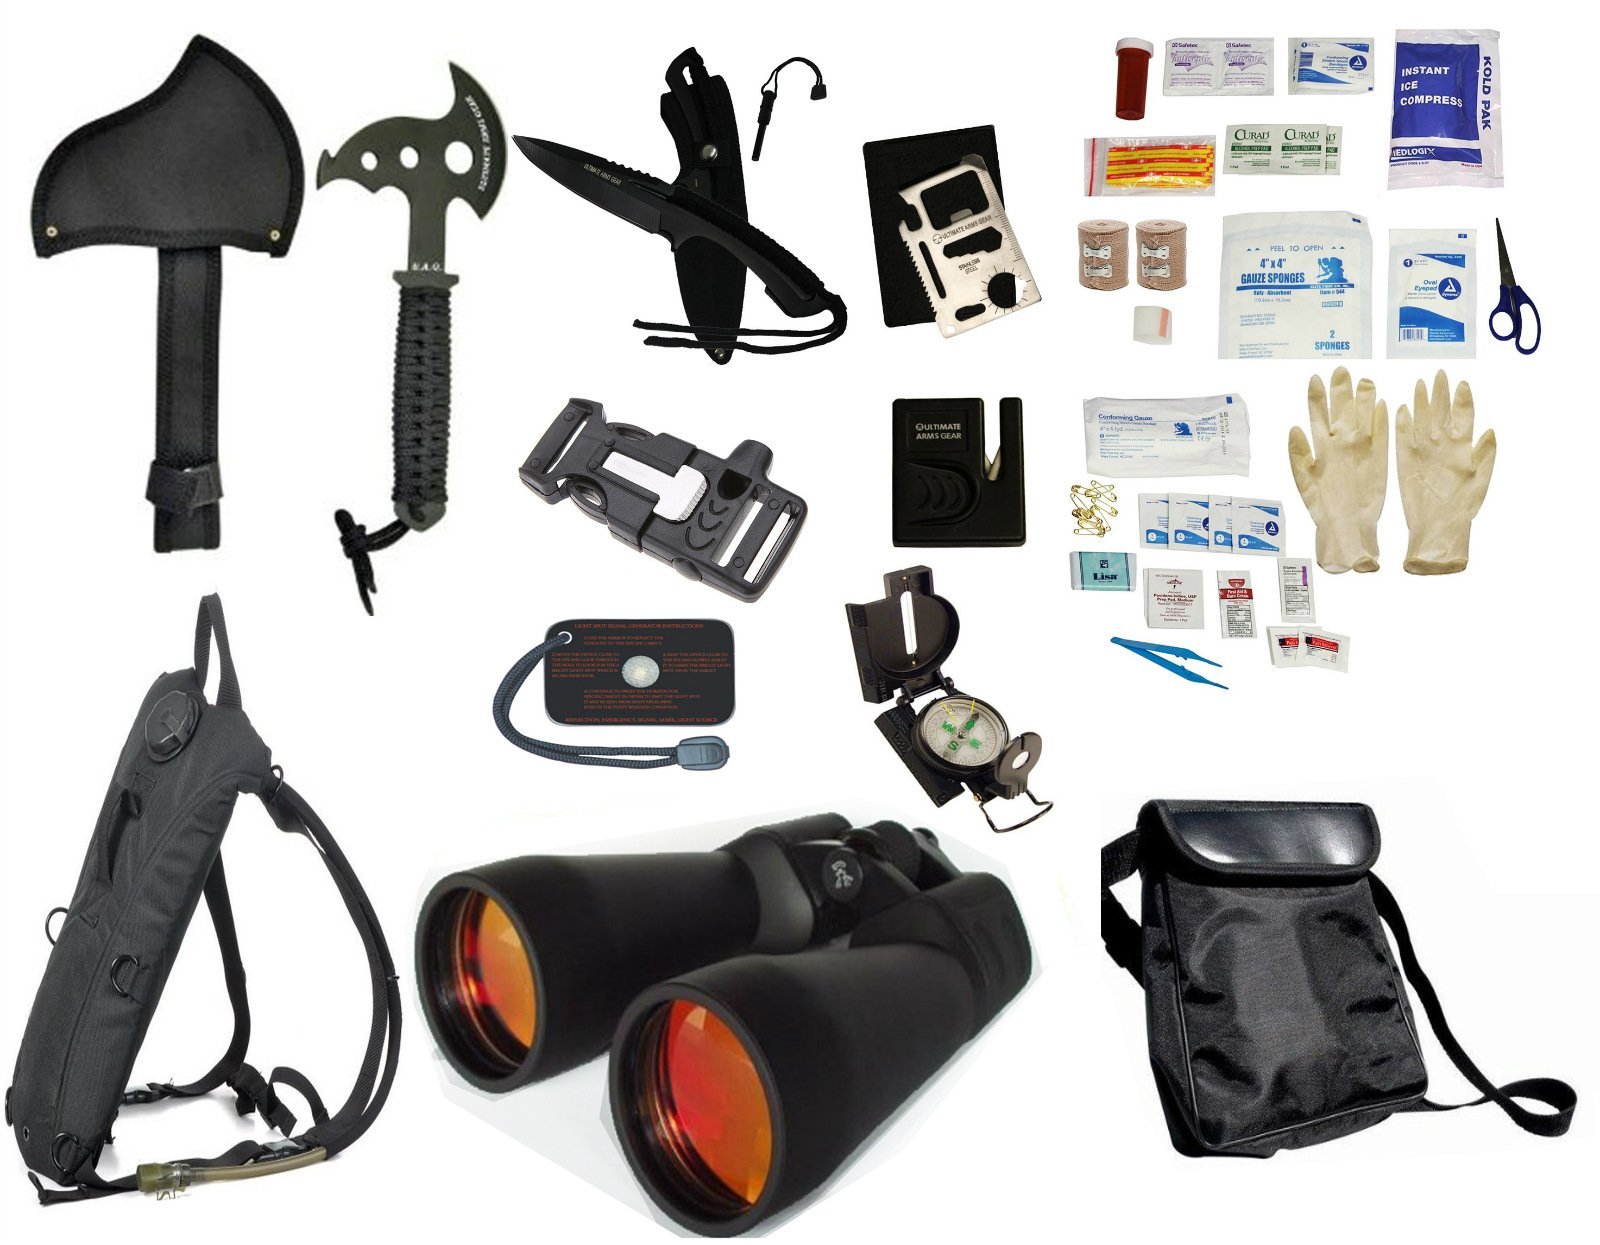 Survival Camping Hiking Kit: Emergency First Aid, 20X70 Binoculars Ruby,Sharpener, Axe, Fire Starter Blade, Whistle Flint Striker Belt Buckle, Hydration Backpack, Multi Tool, Compass, Signal Mirror